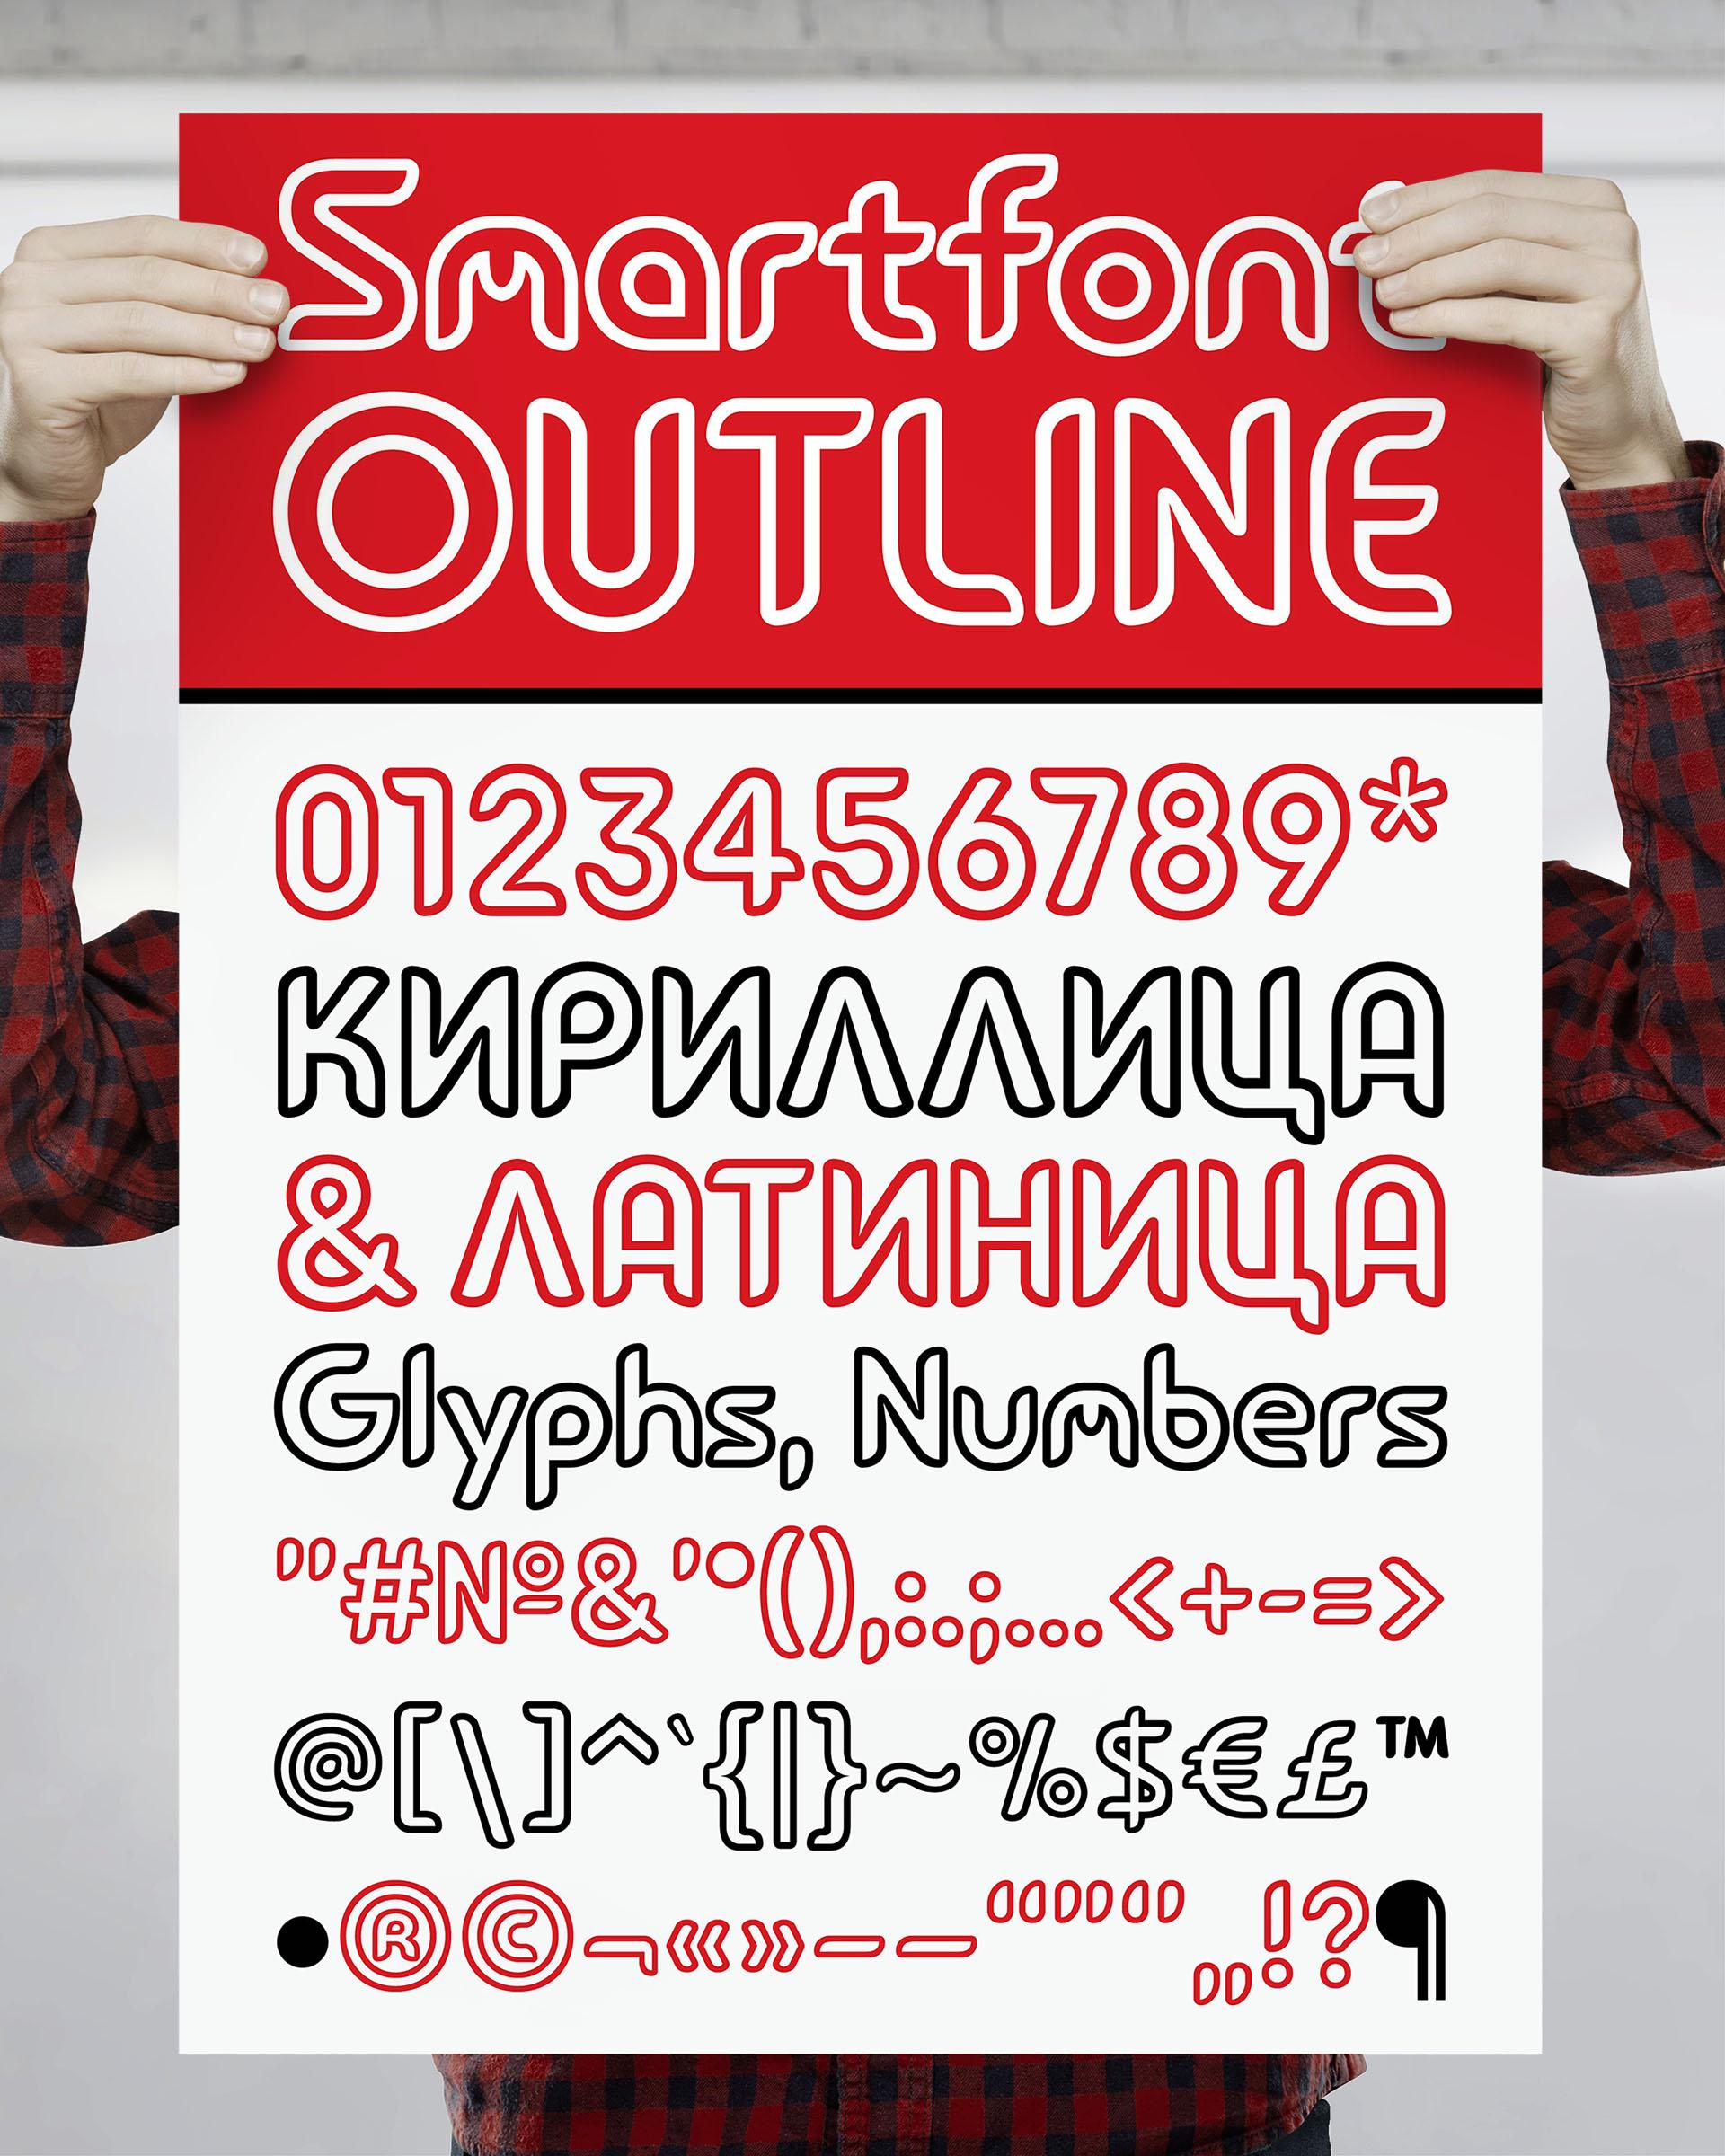 smartfont_1 копия